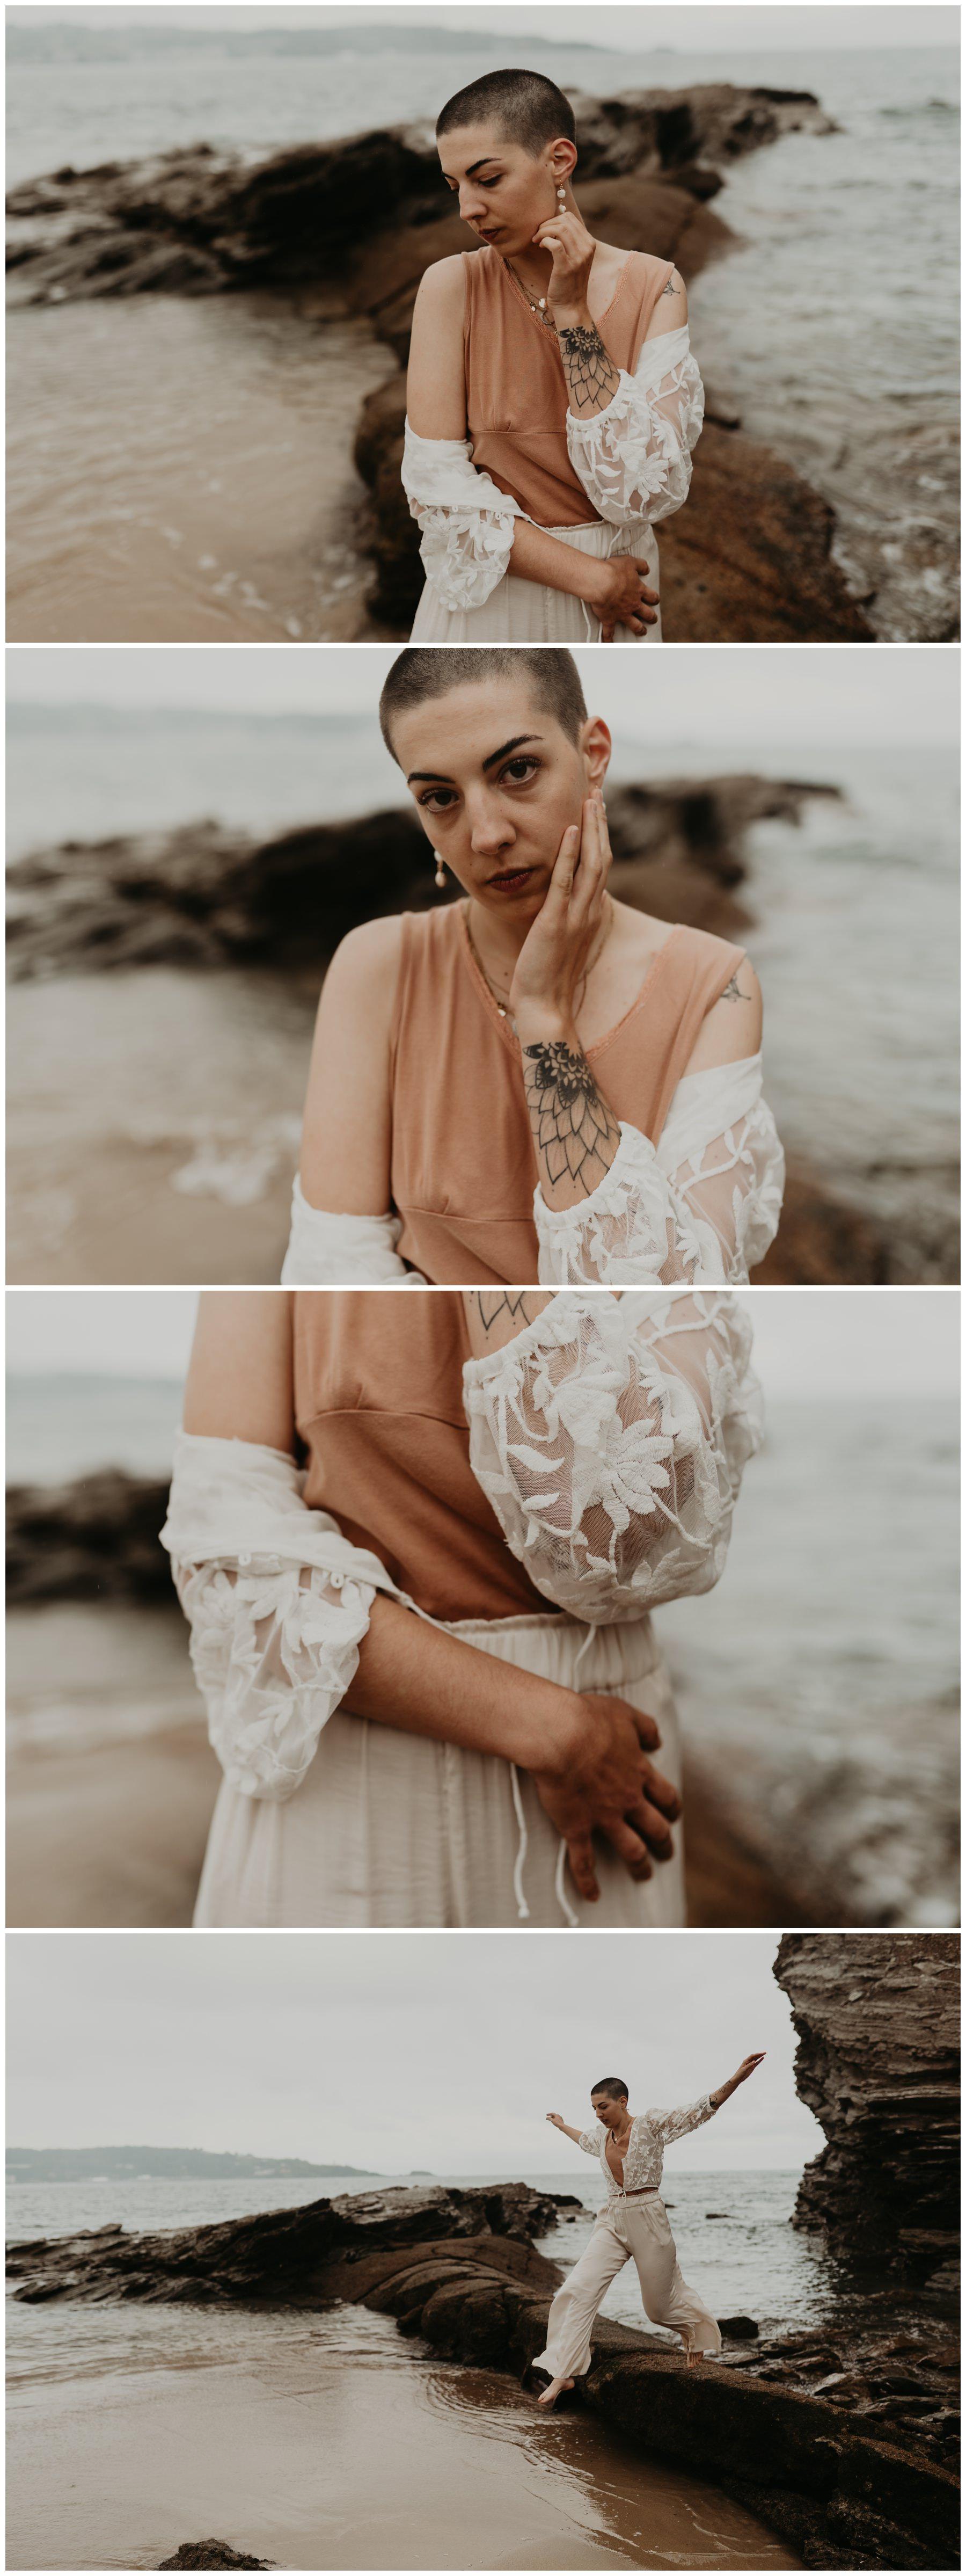 photographe portrait femme hendaye